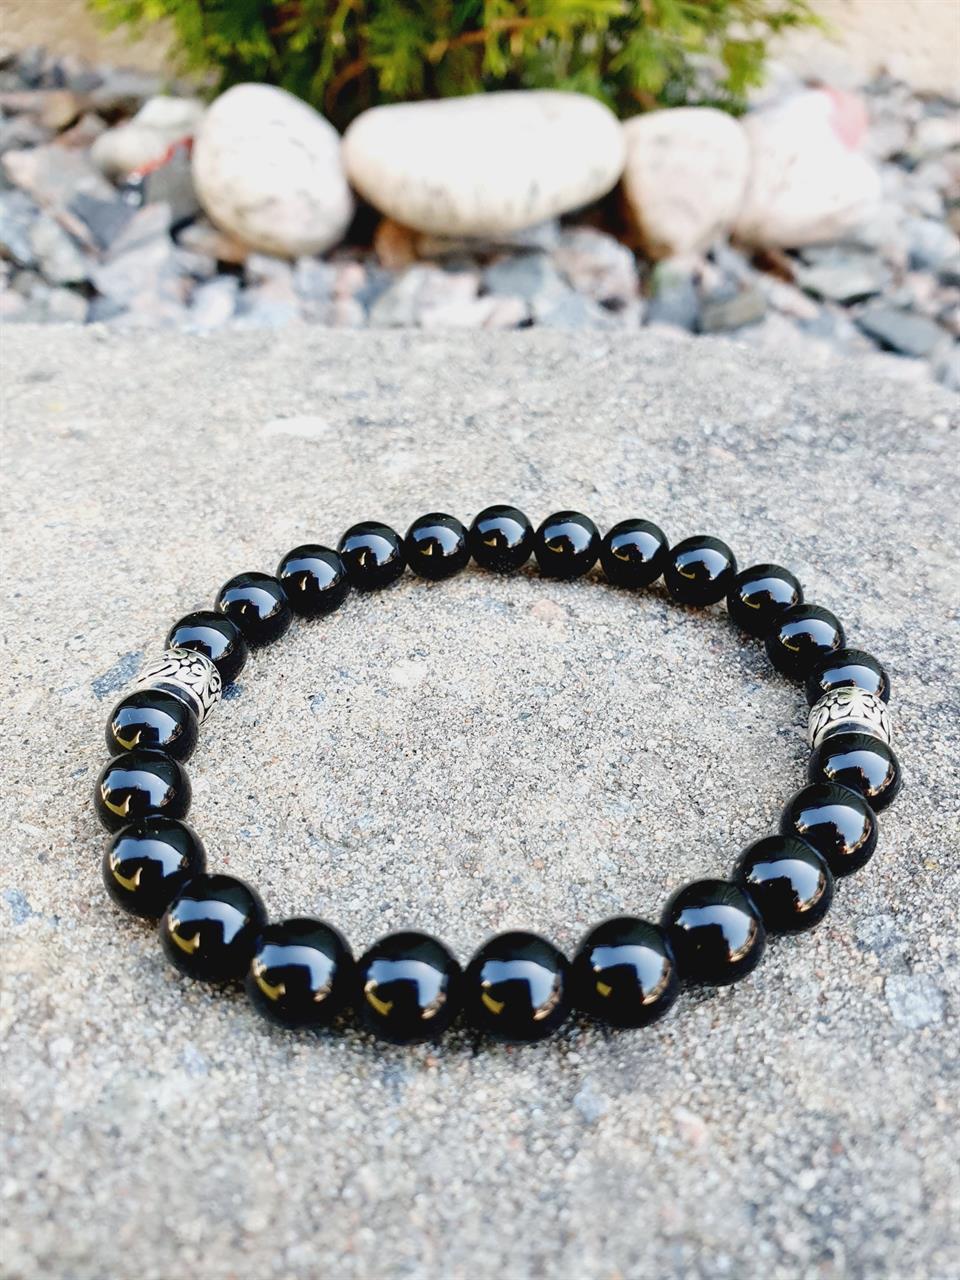 Armband svart pärlor/stenar onyx